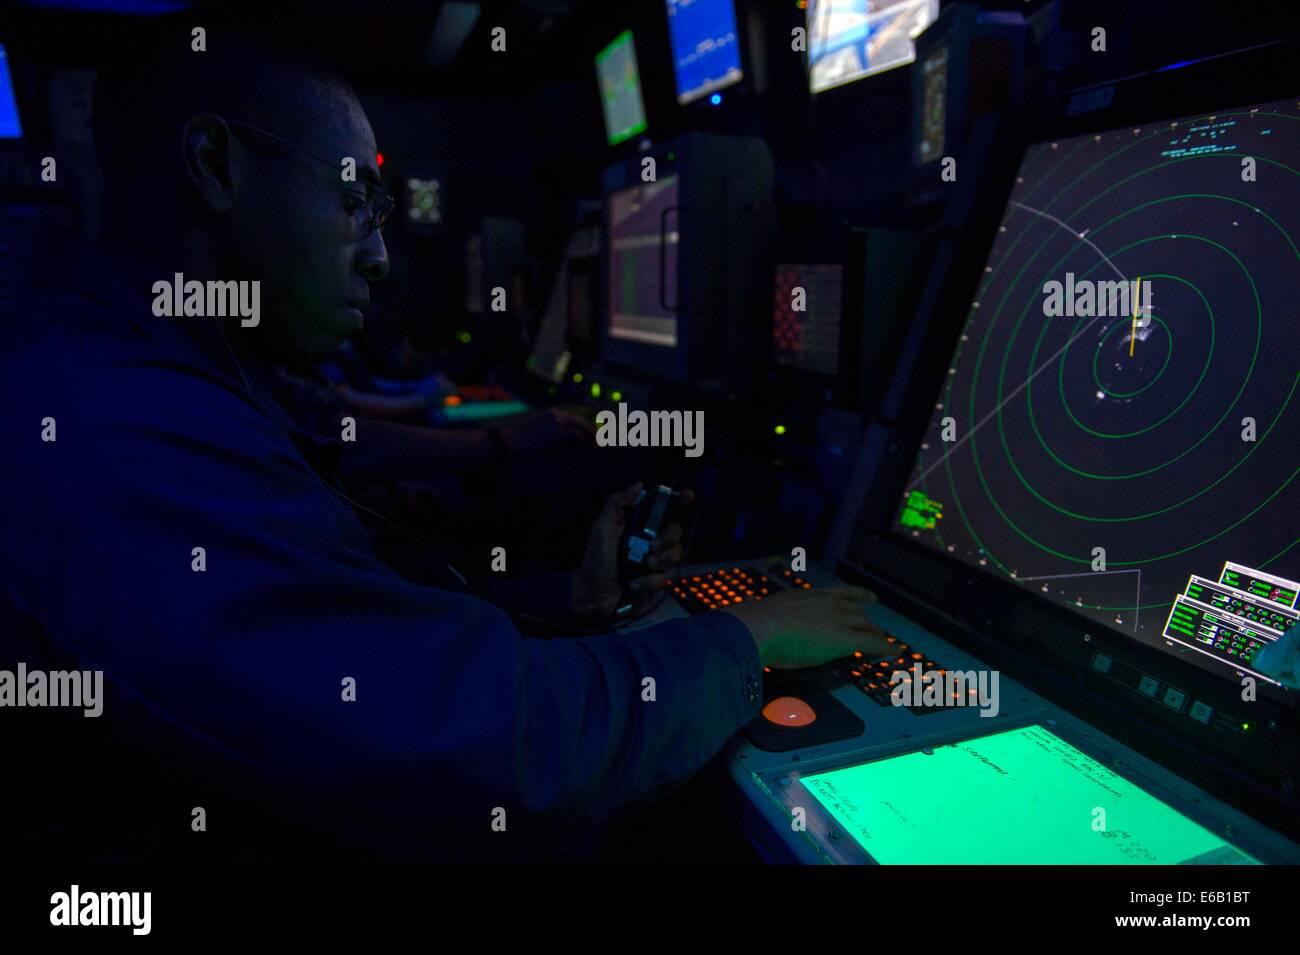 Marina de primera clase de controlador de Tránsito Aéreo Fernando Montes significa ver control de aproximación Imagen De Stock